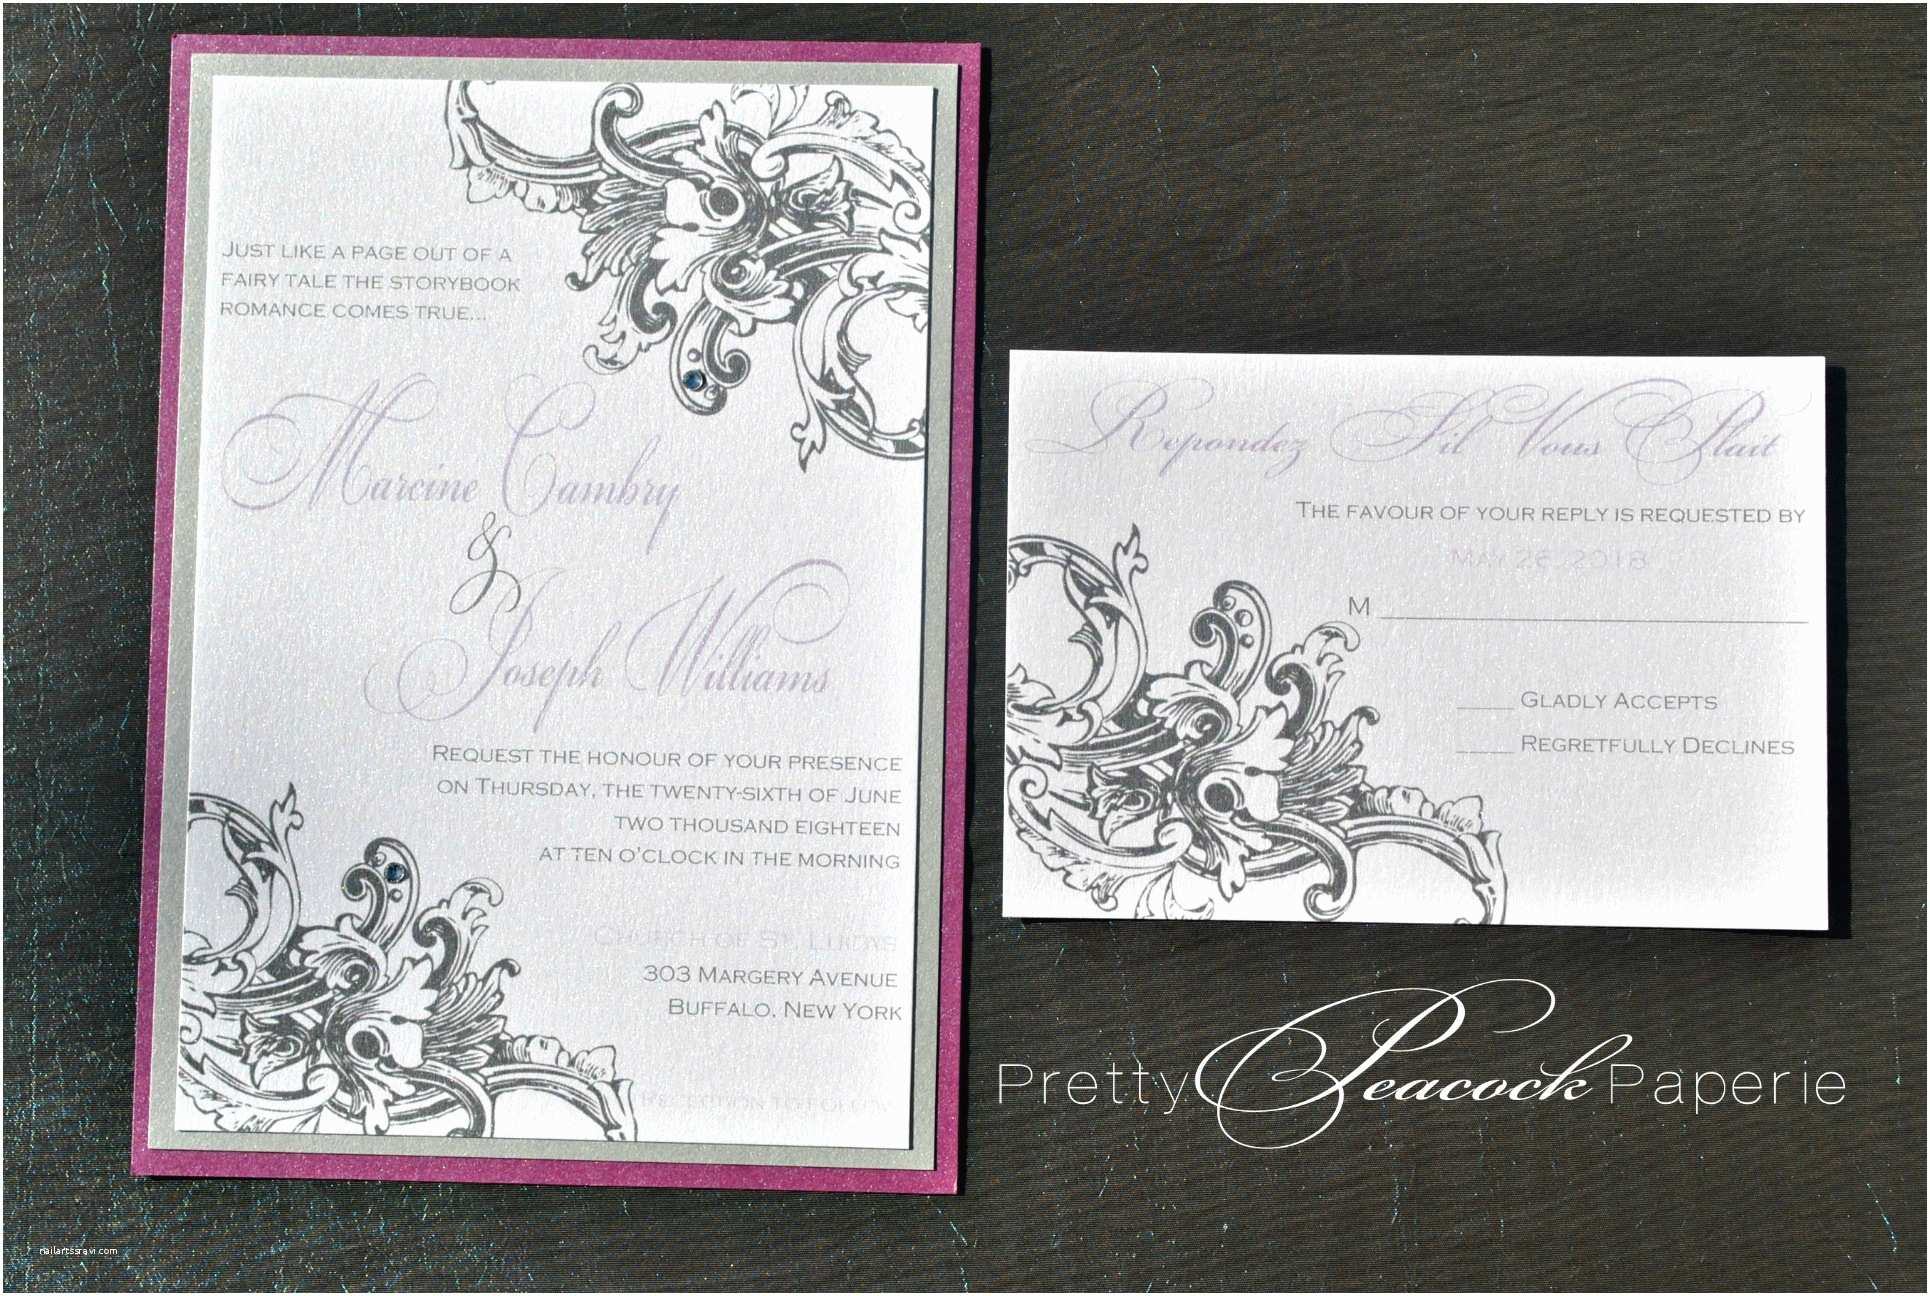 Wedding Invitations orlando Fl French Baroque Invitation Suite by Pretty Peacock Paperie